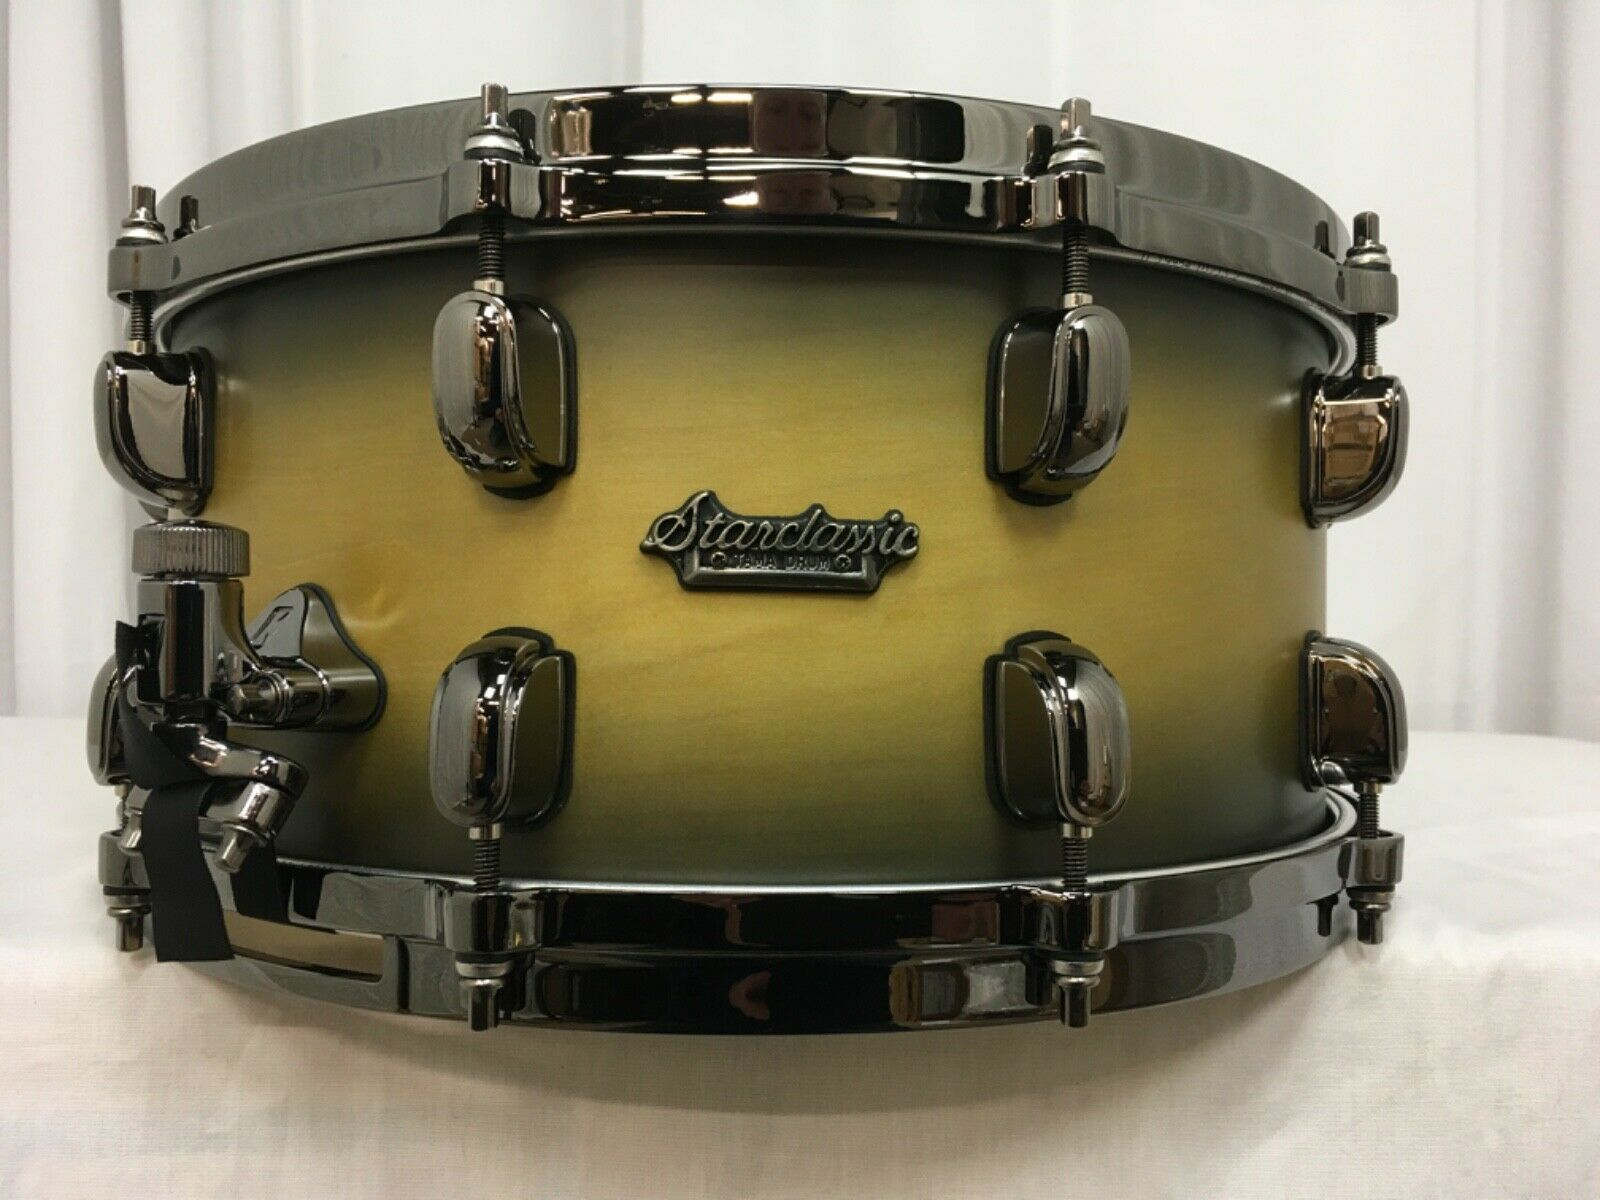 Tama Starclassic Maple 14  Dia. X 6.5  Deep Snare Drum Harvest Dusk Burst New